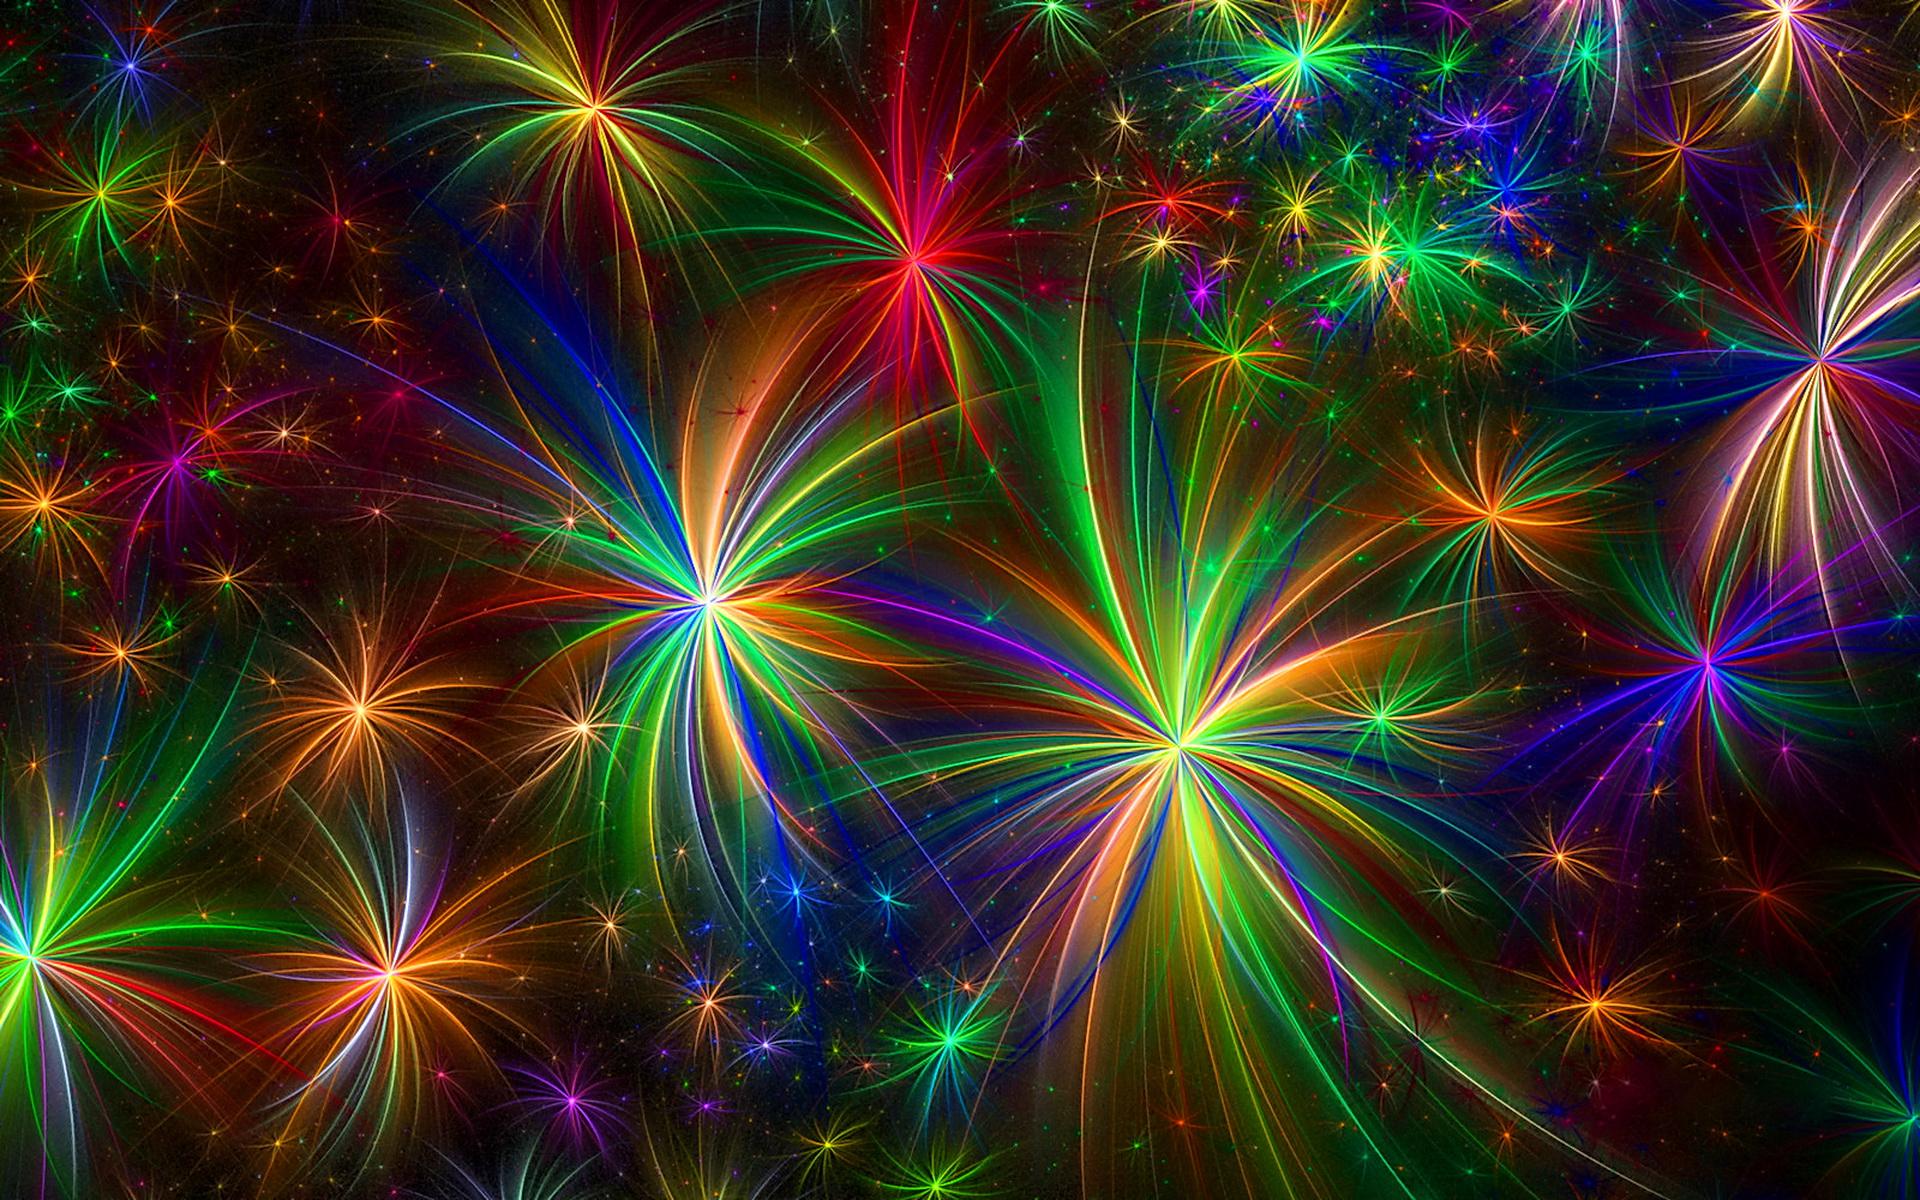 Fireworks Shows Fourth Of July Hd Desktop Wallpaper Widescreen 1920x1200